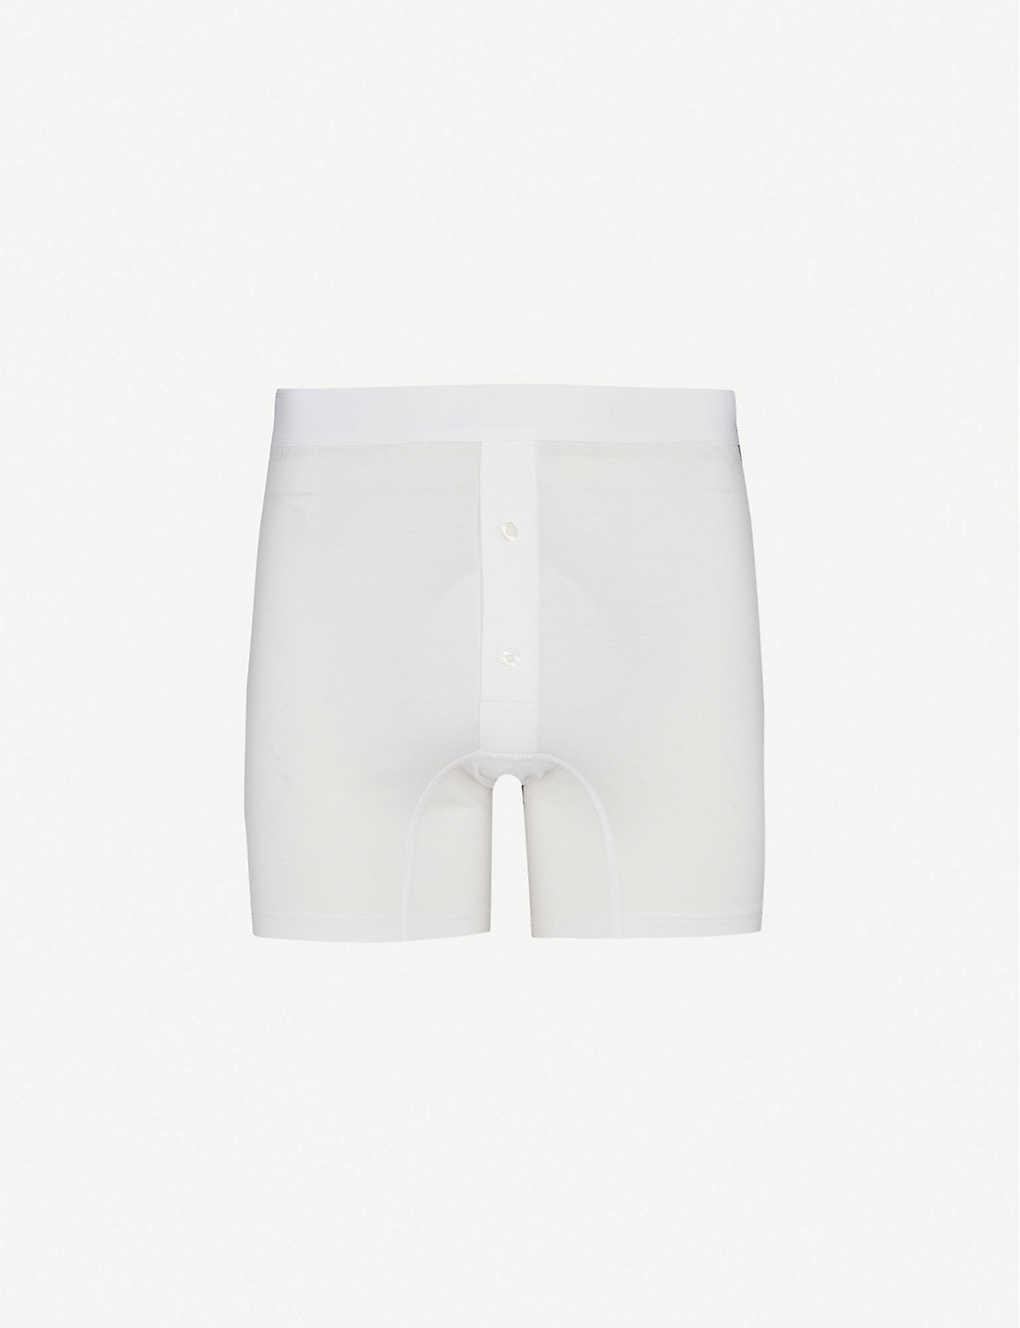 6290fff21b51 SUNSPEL - Two–button boxer shorts | Selfridges.com